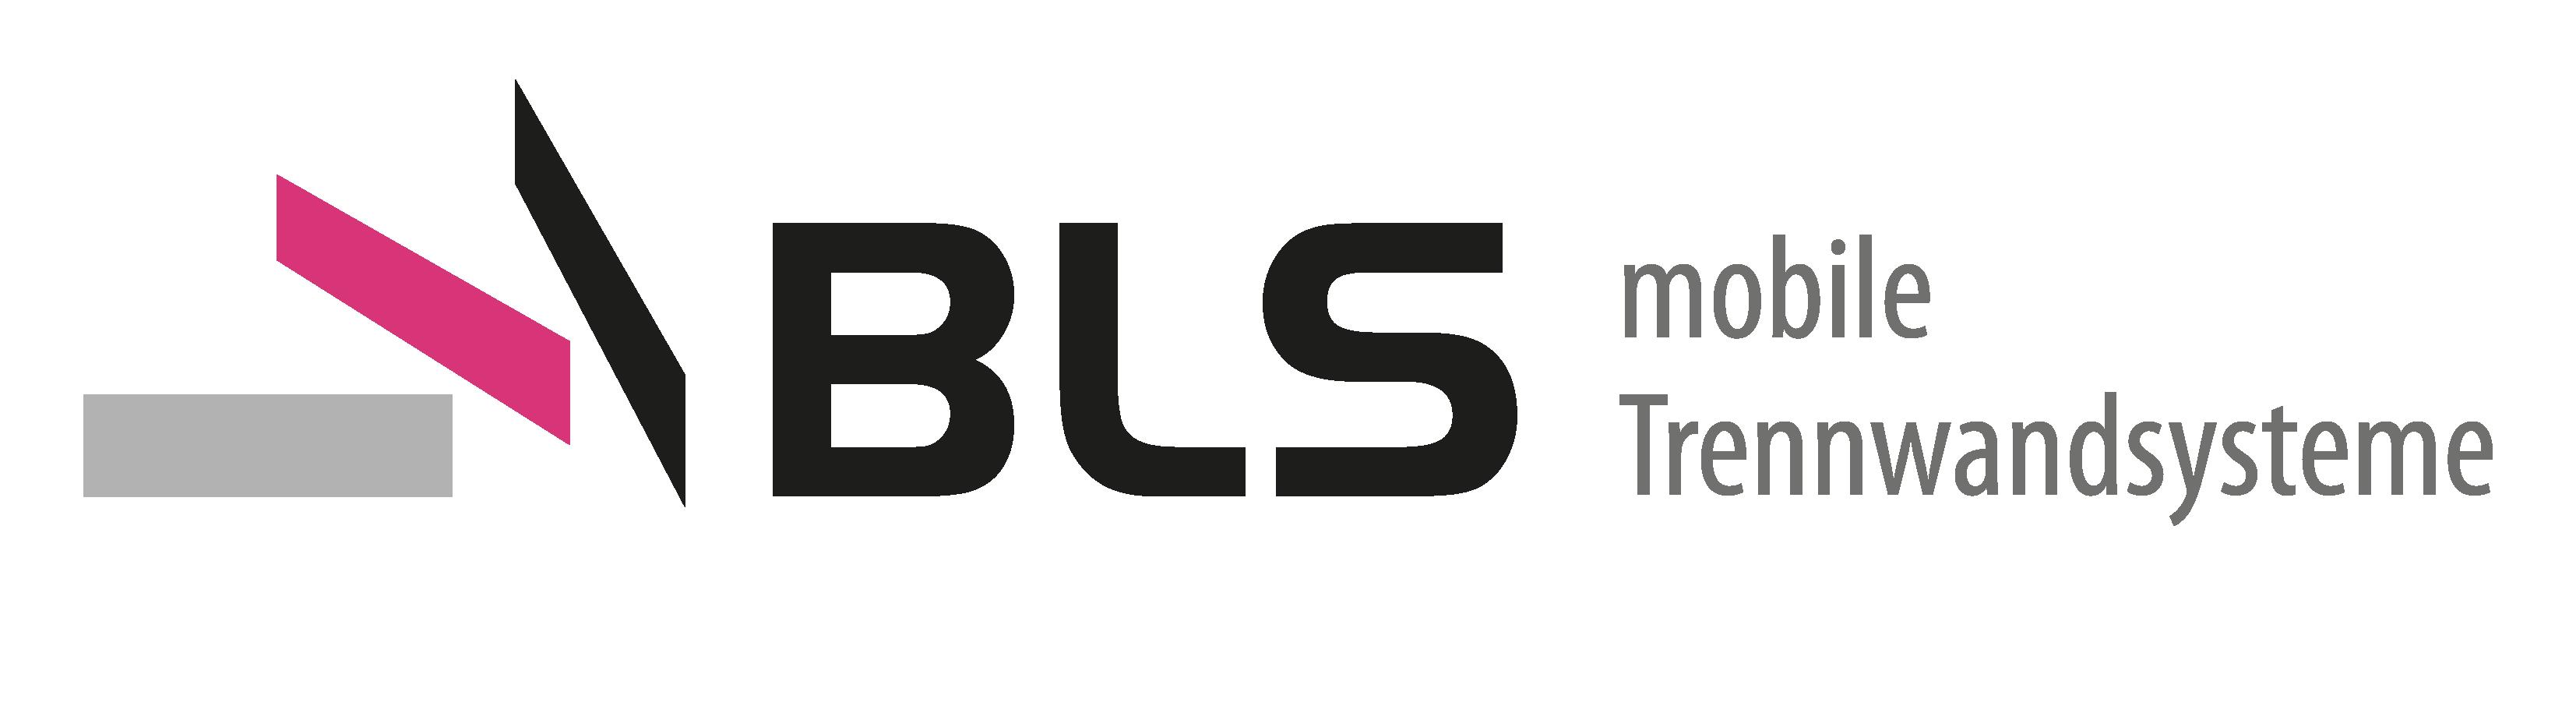 BLS mobile Trennwandsysteme GmbH + Co. KG